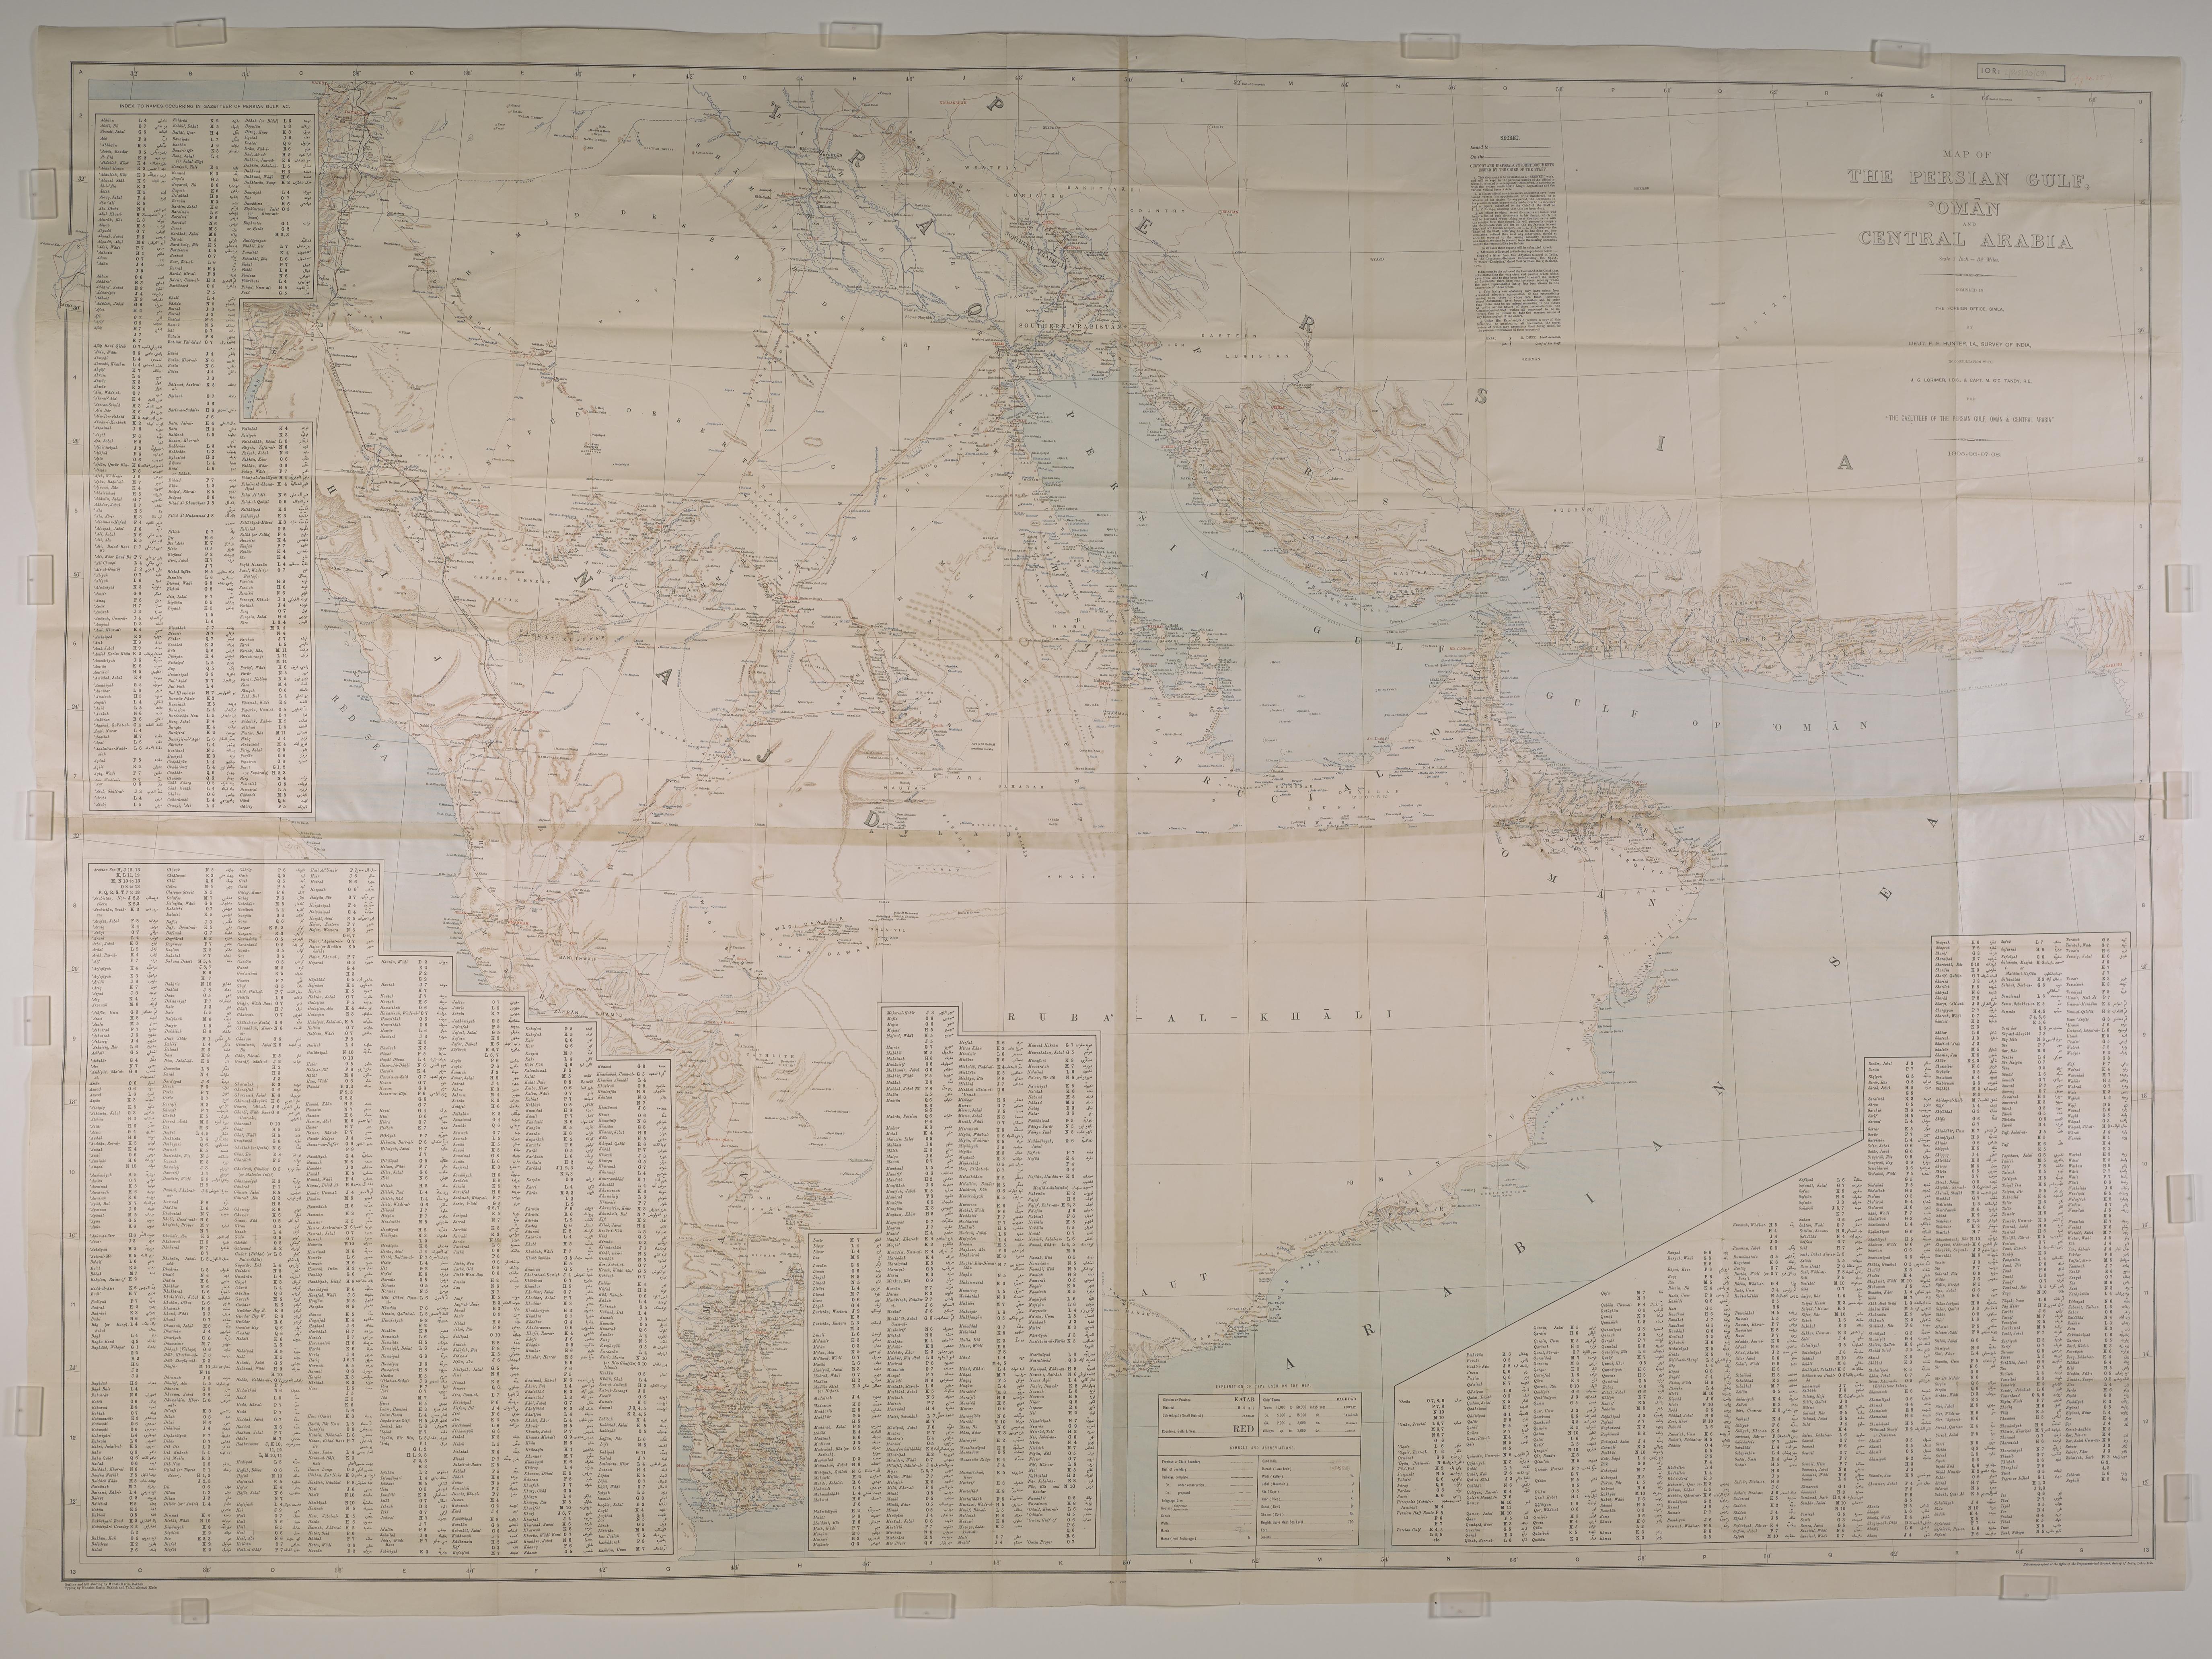 Hunter's Map of Arabia